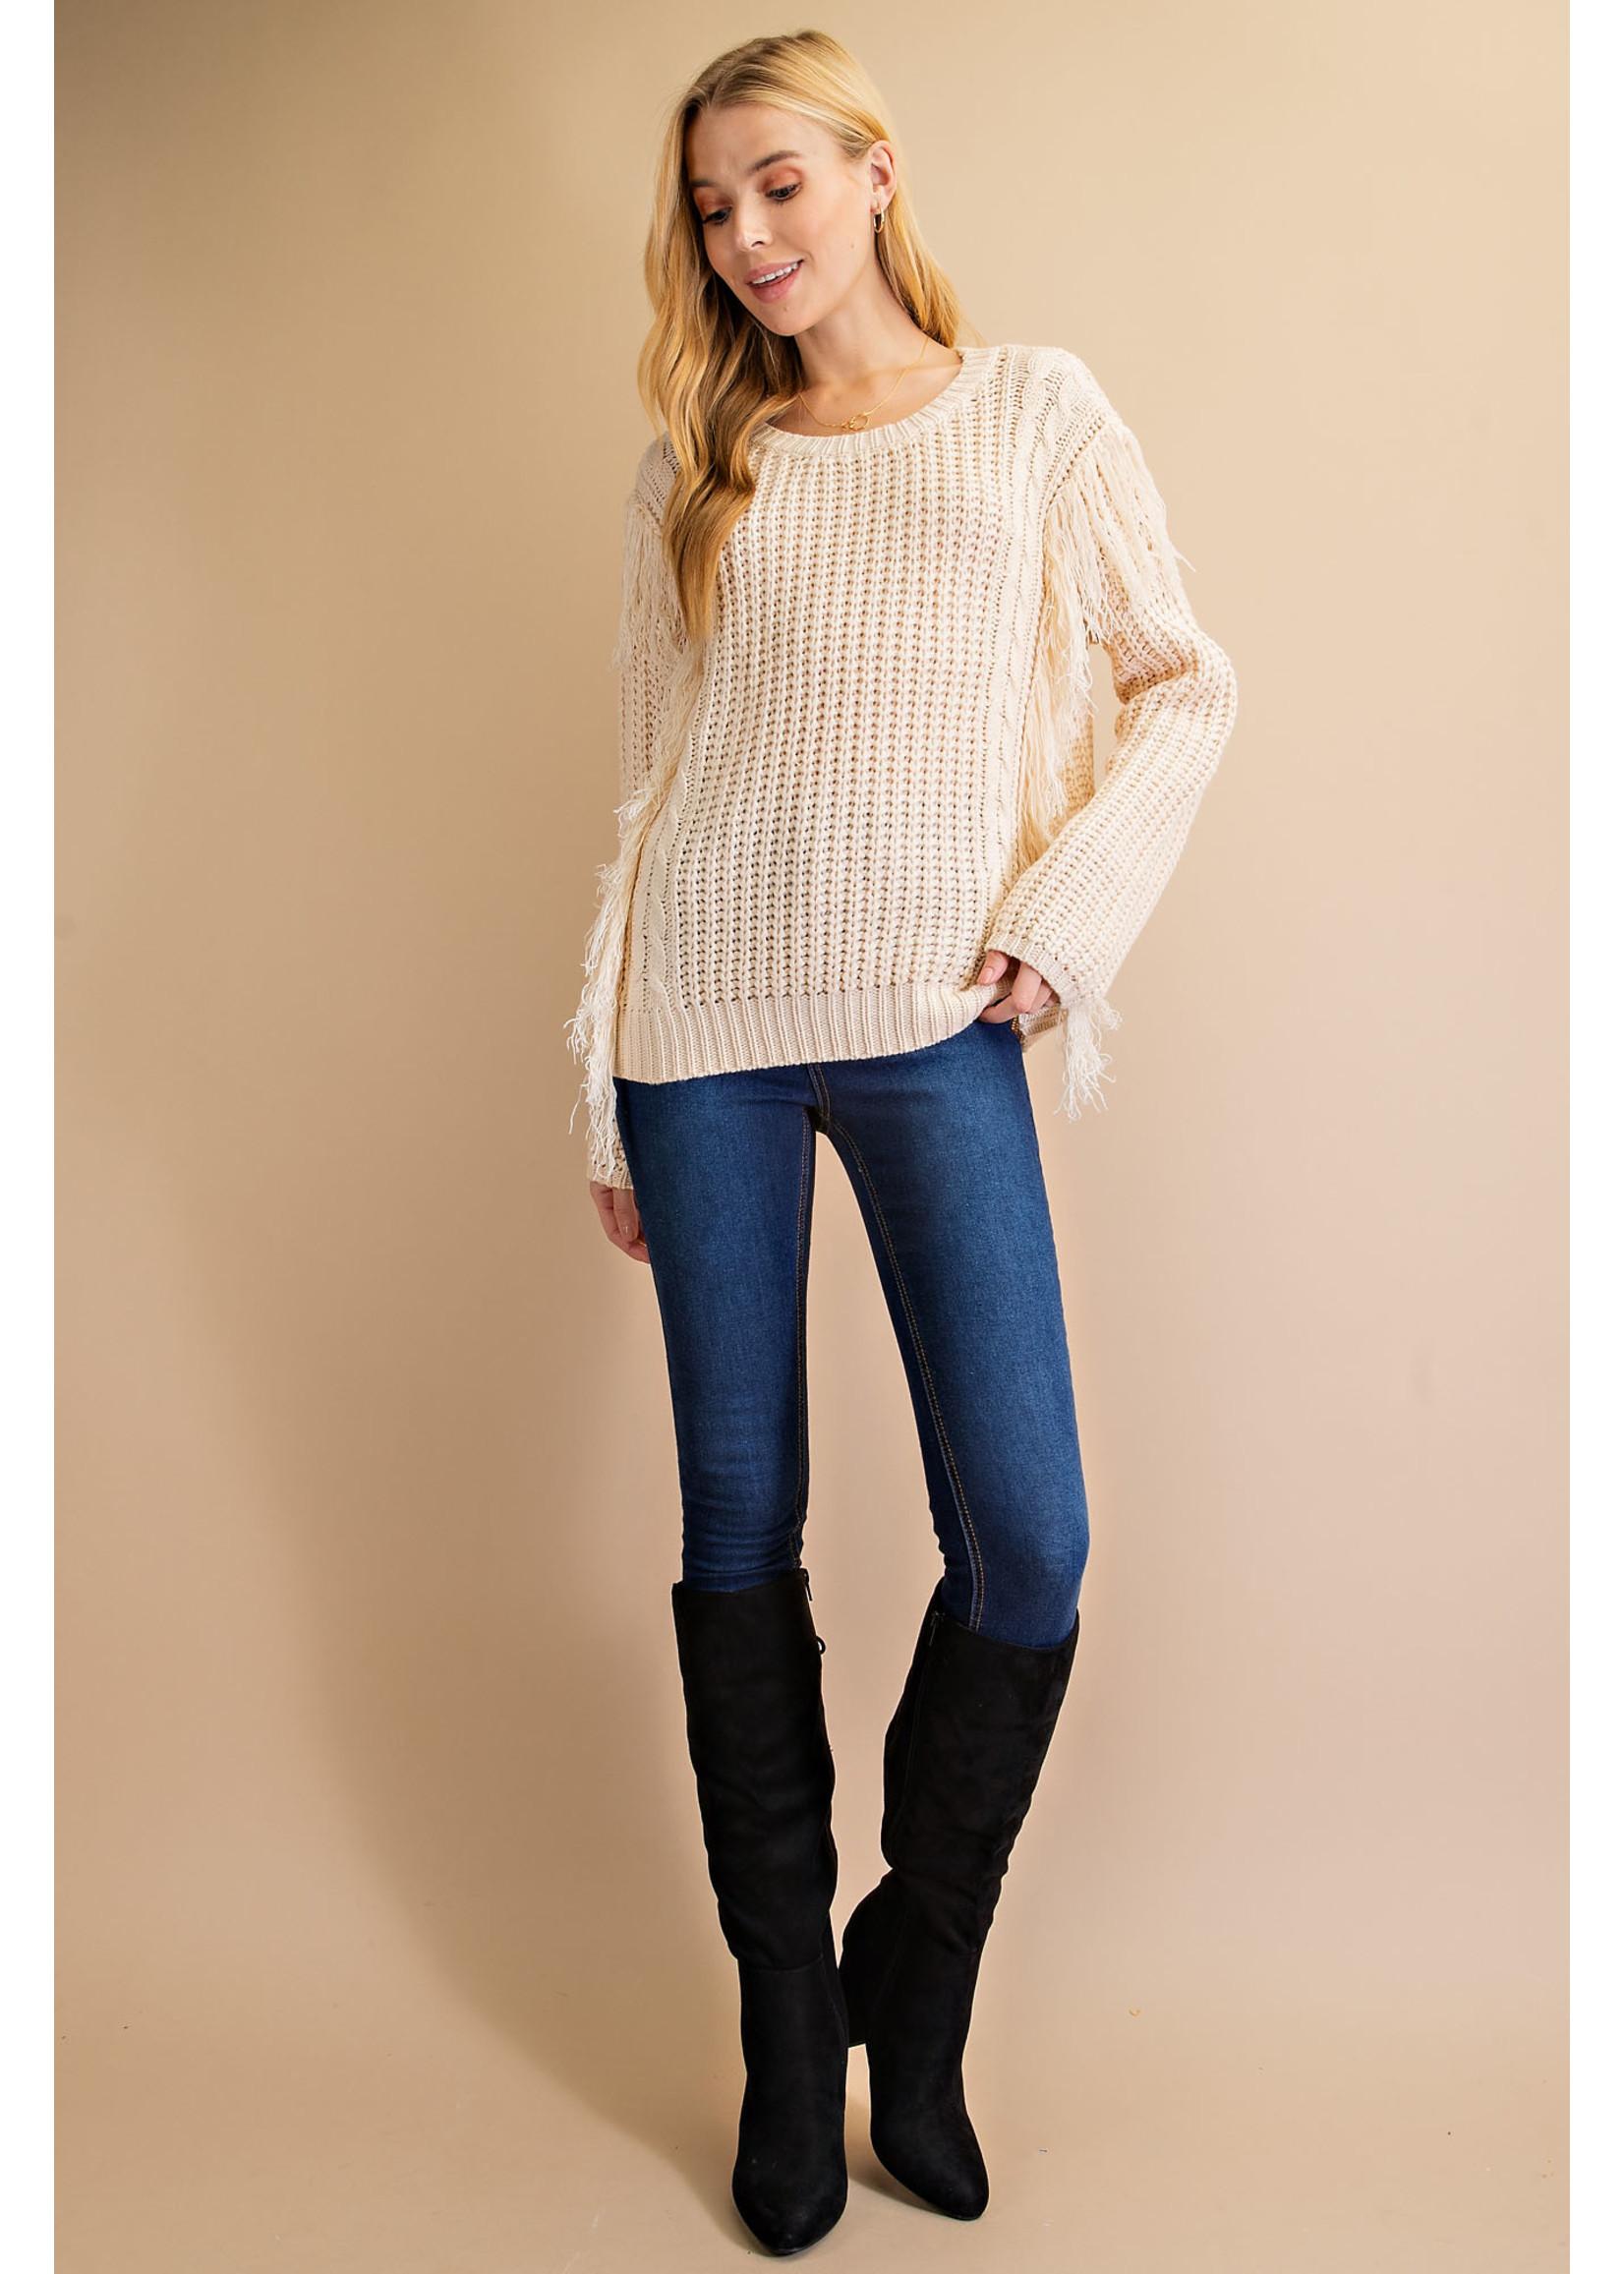 L Love Fringe Pullover Sweater